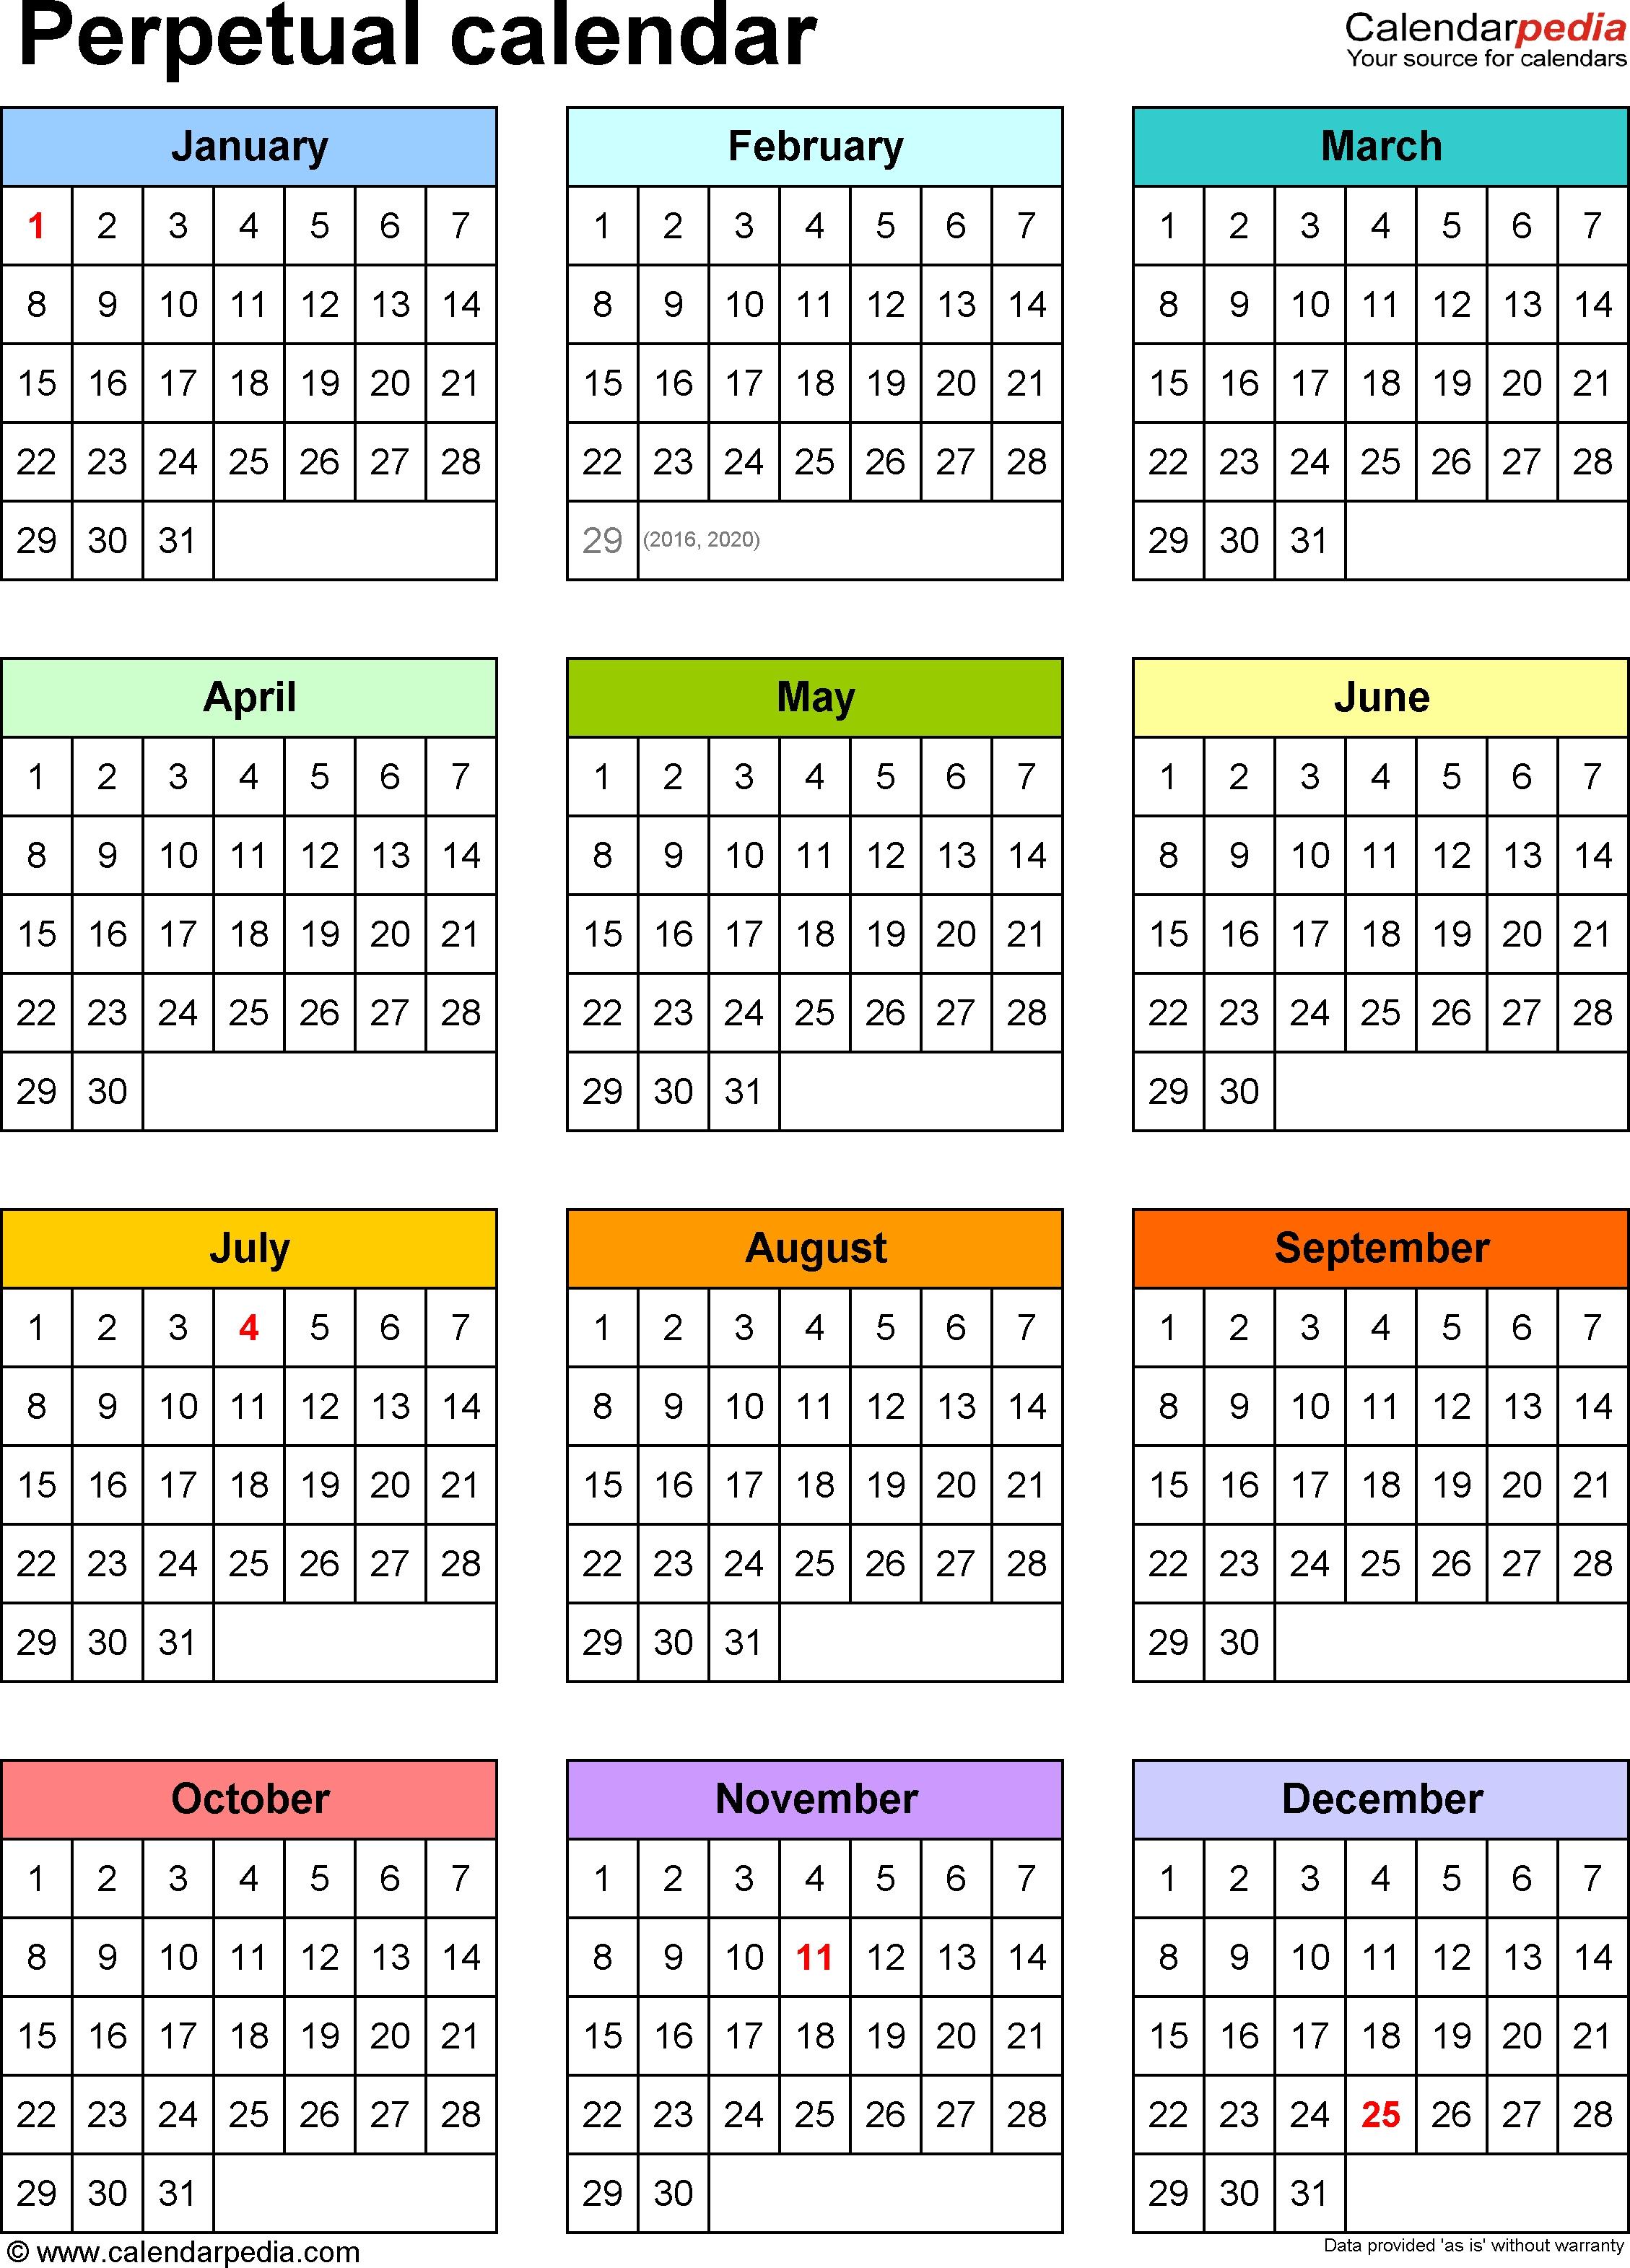 Perpetual Calendars - 7 Free Printable Word Templates